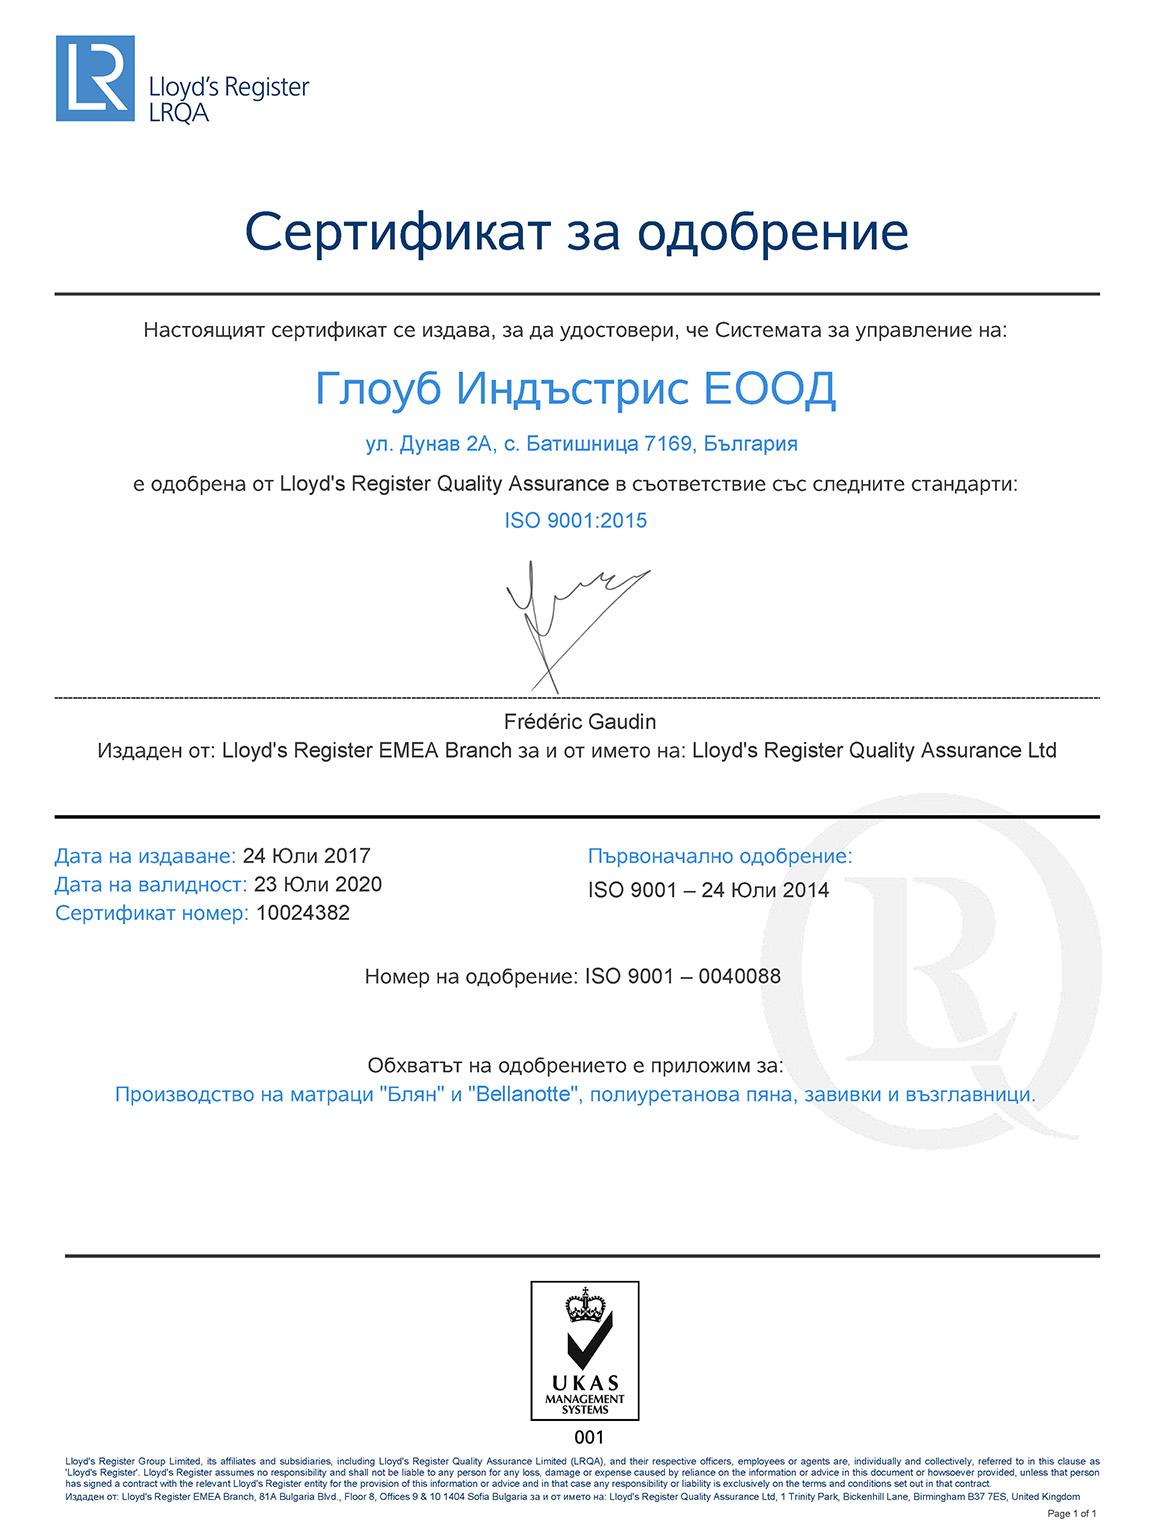 Сертификат за одобрение ISO 9001 – 0040088